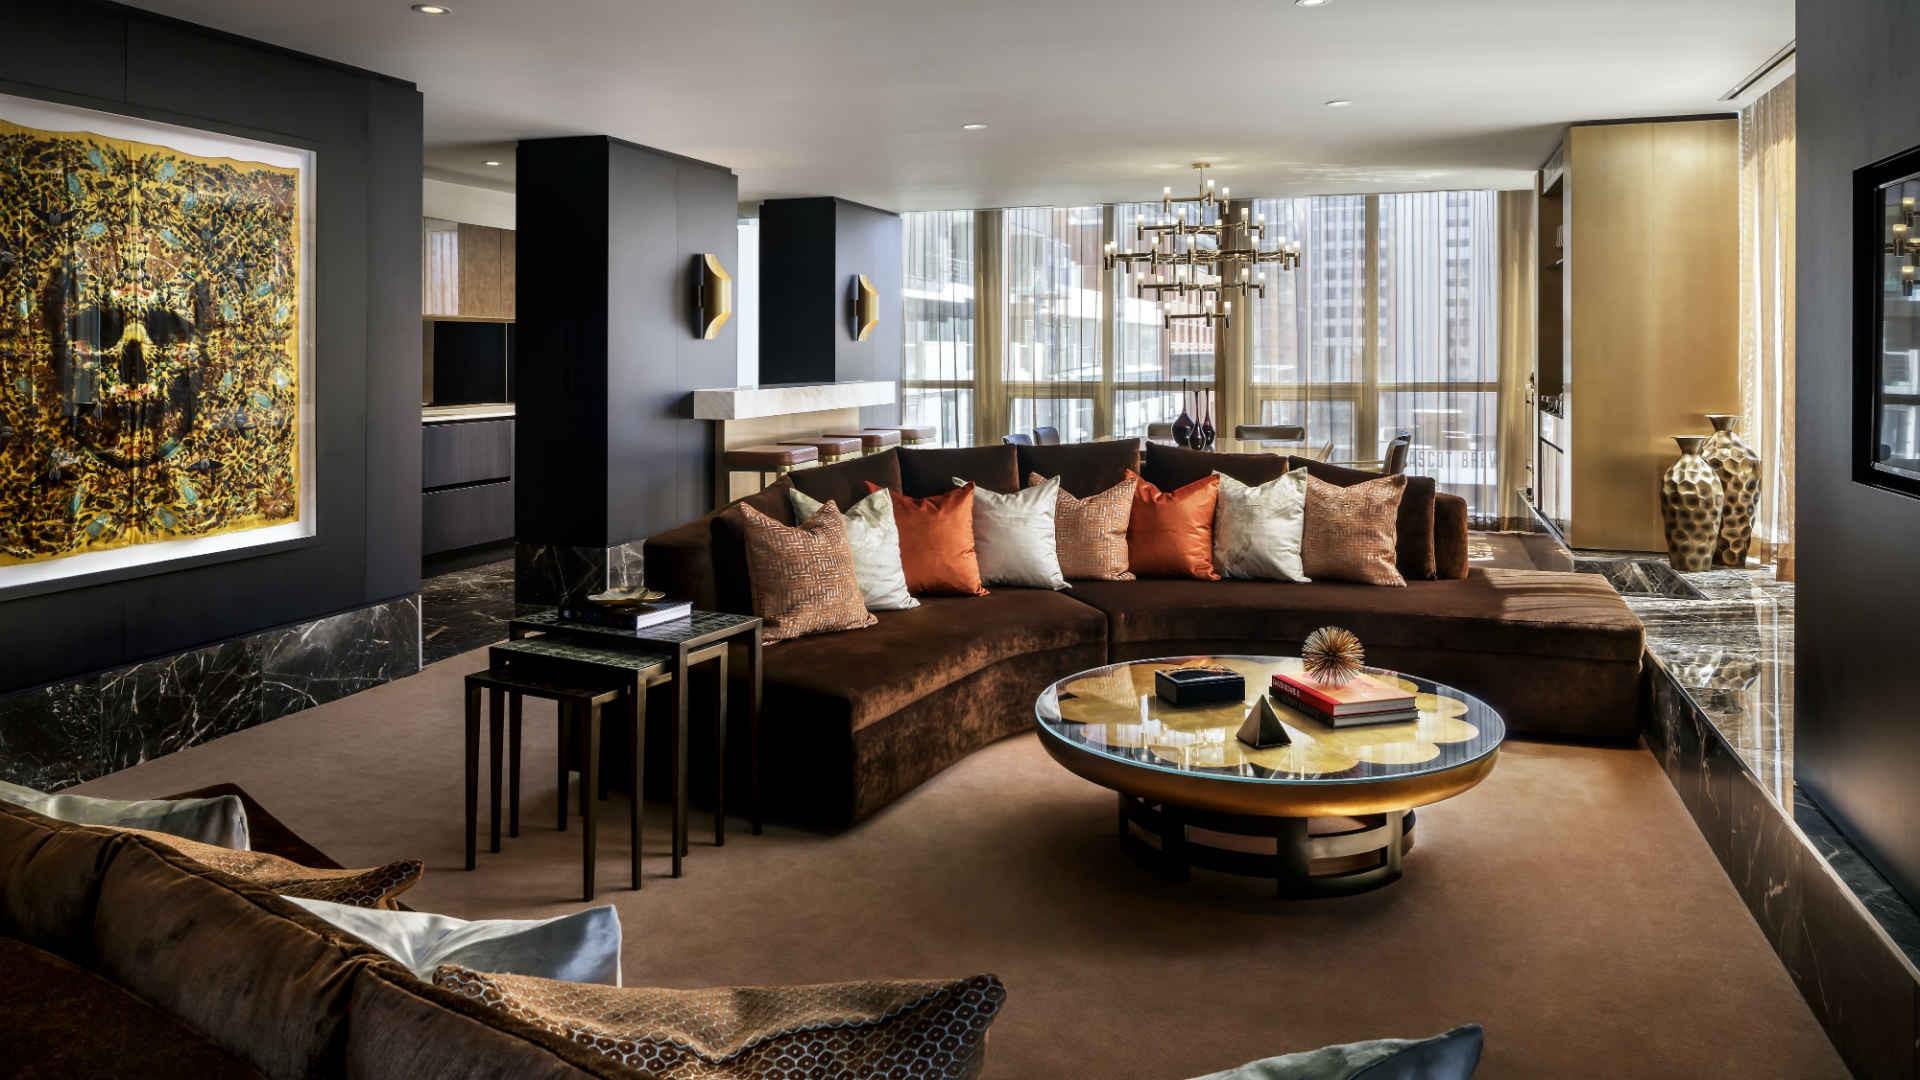 Best hotels Toronto staycation | The Bisha Hotel suite